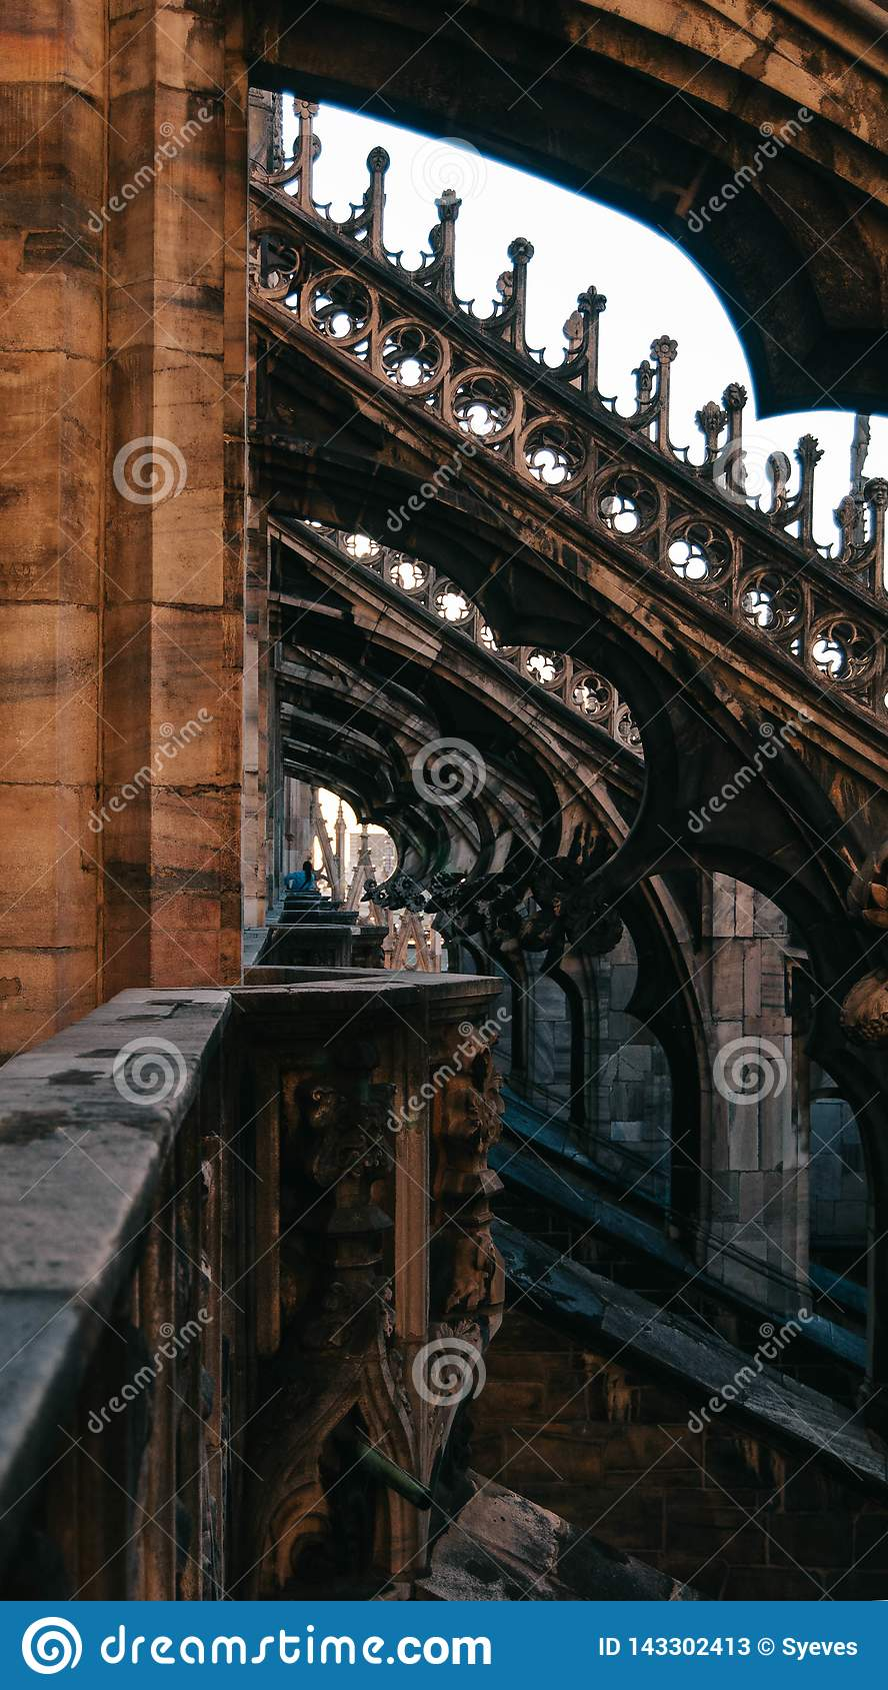 Kathedraal Duomo van Milaan